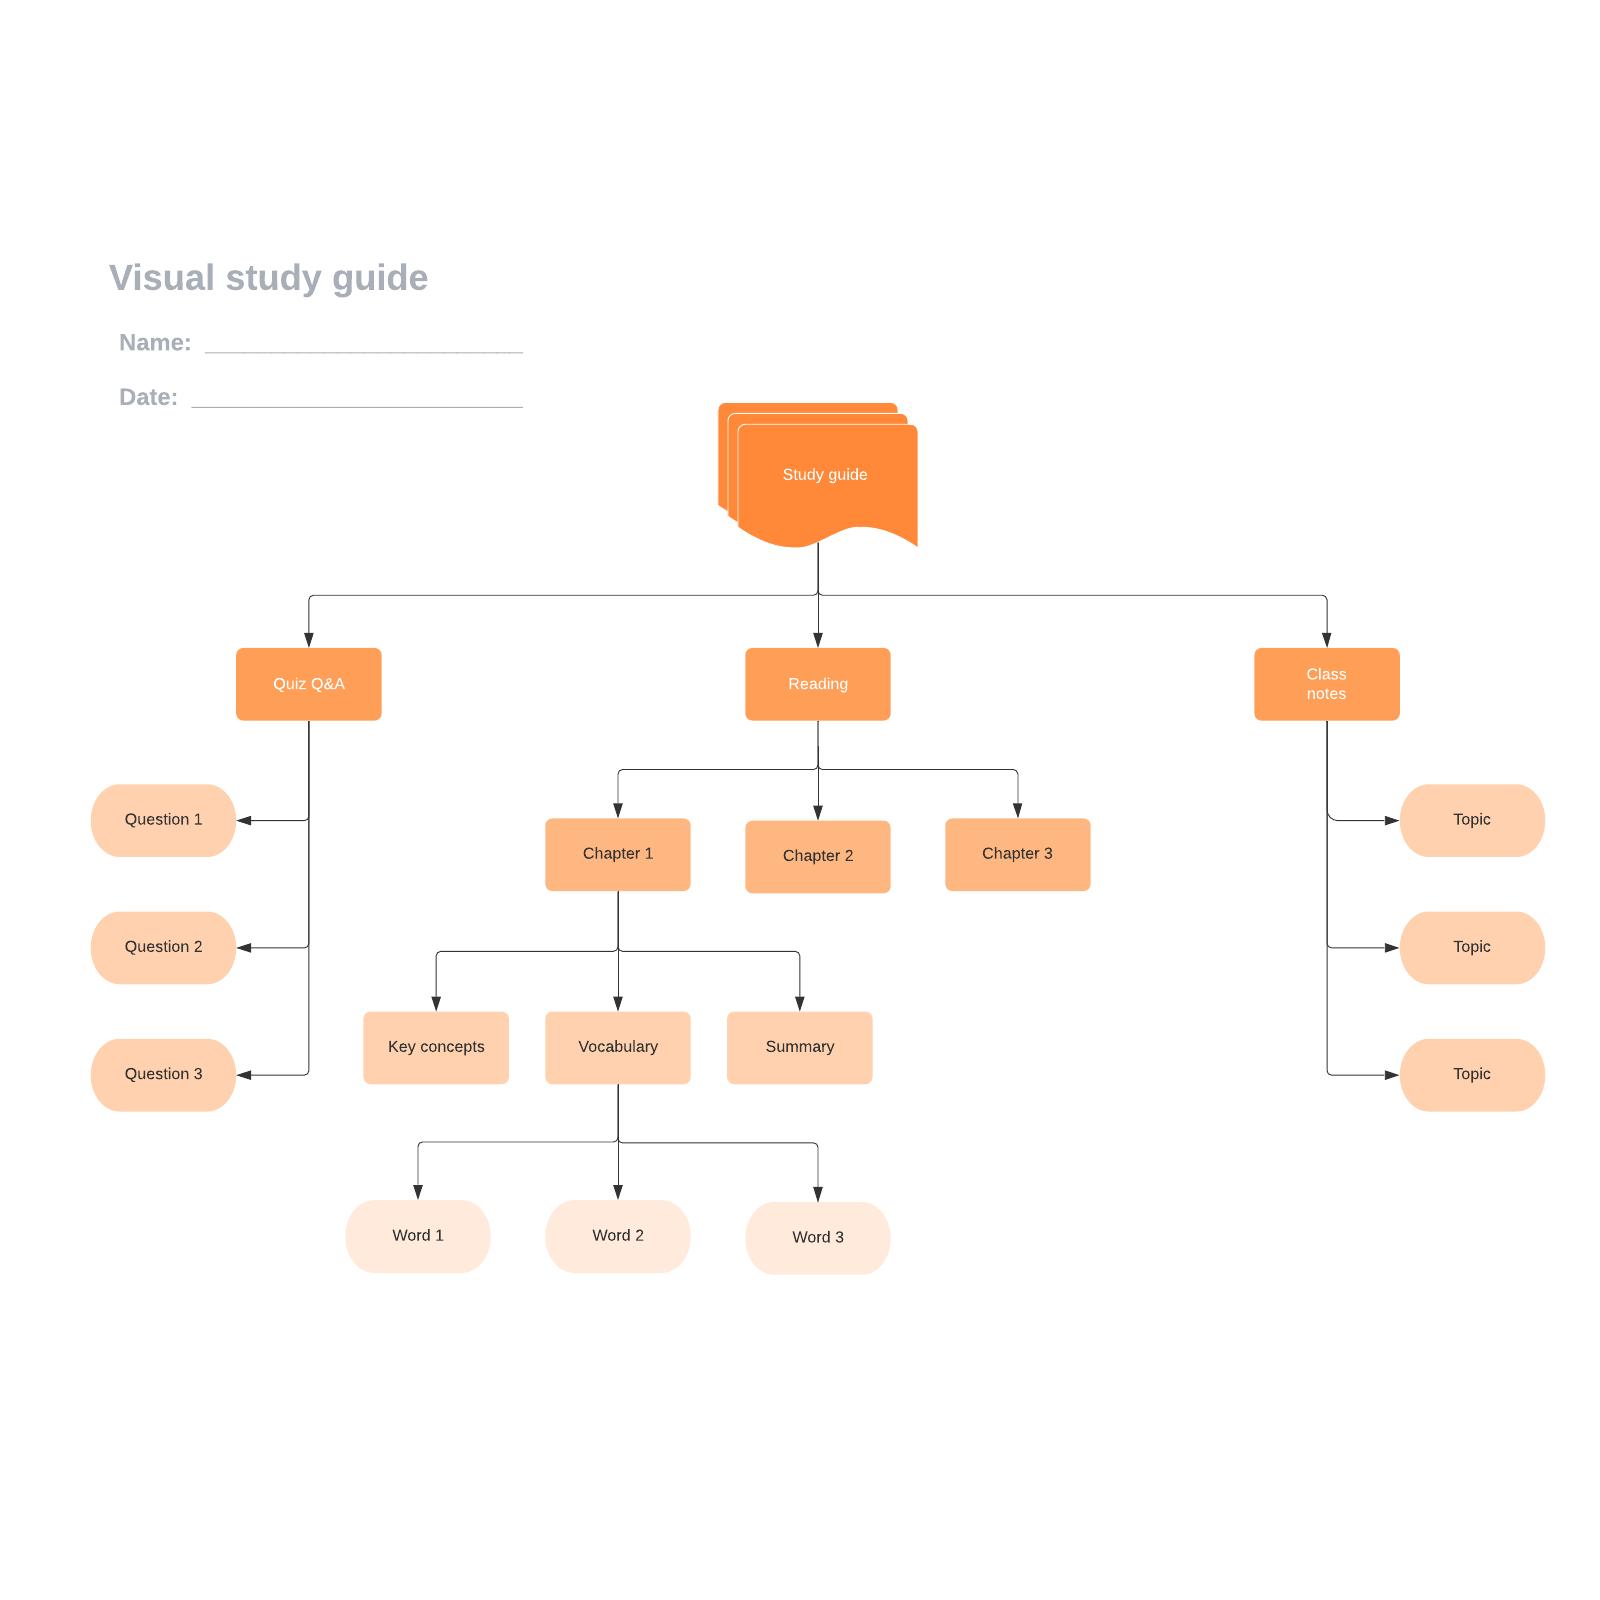 Visual study guide